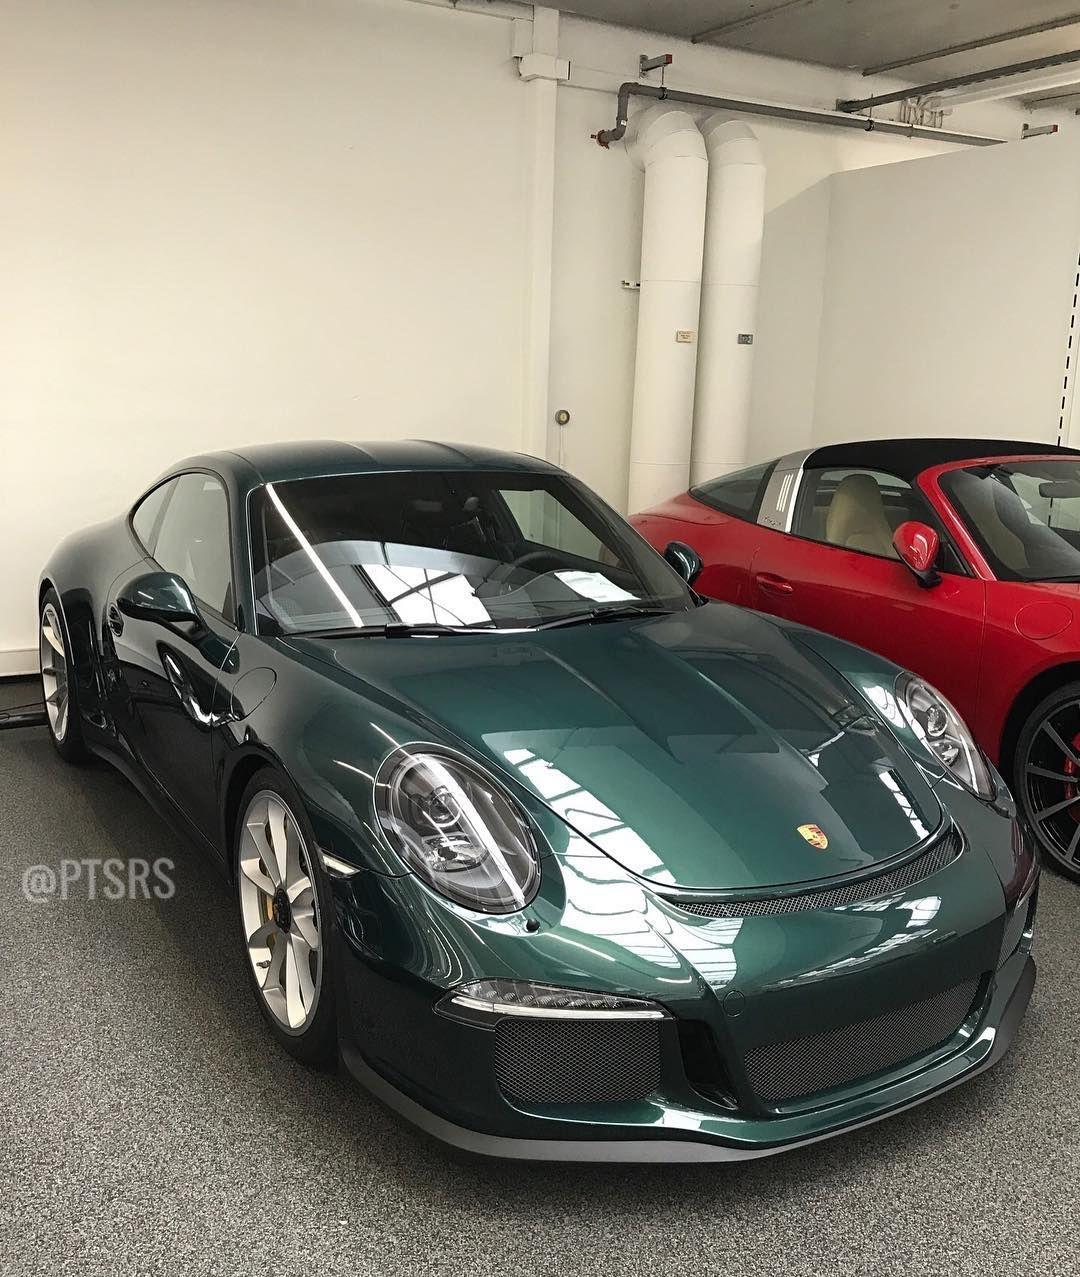 Porsche Racing Green Metallic